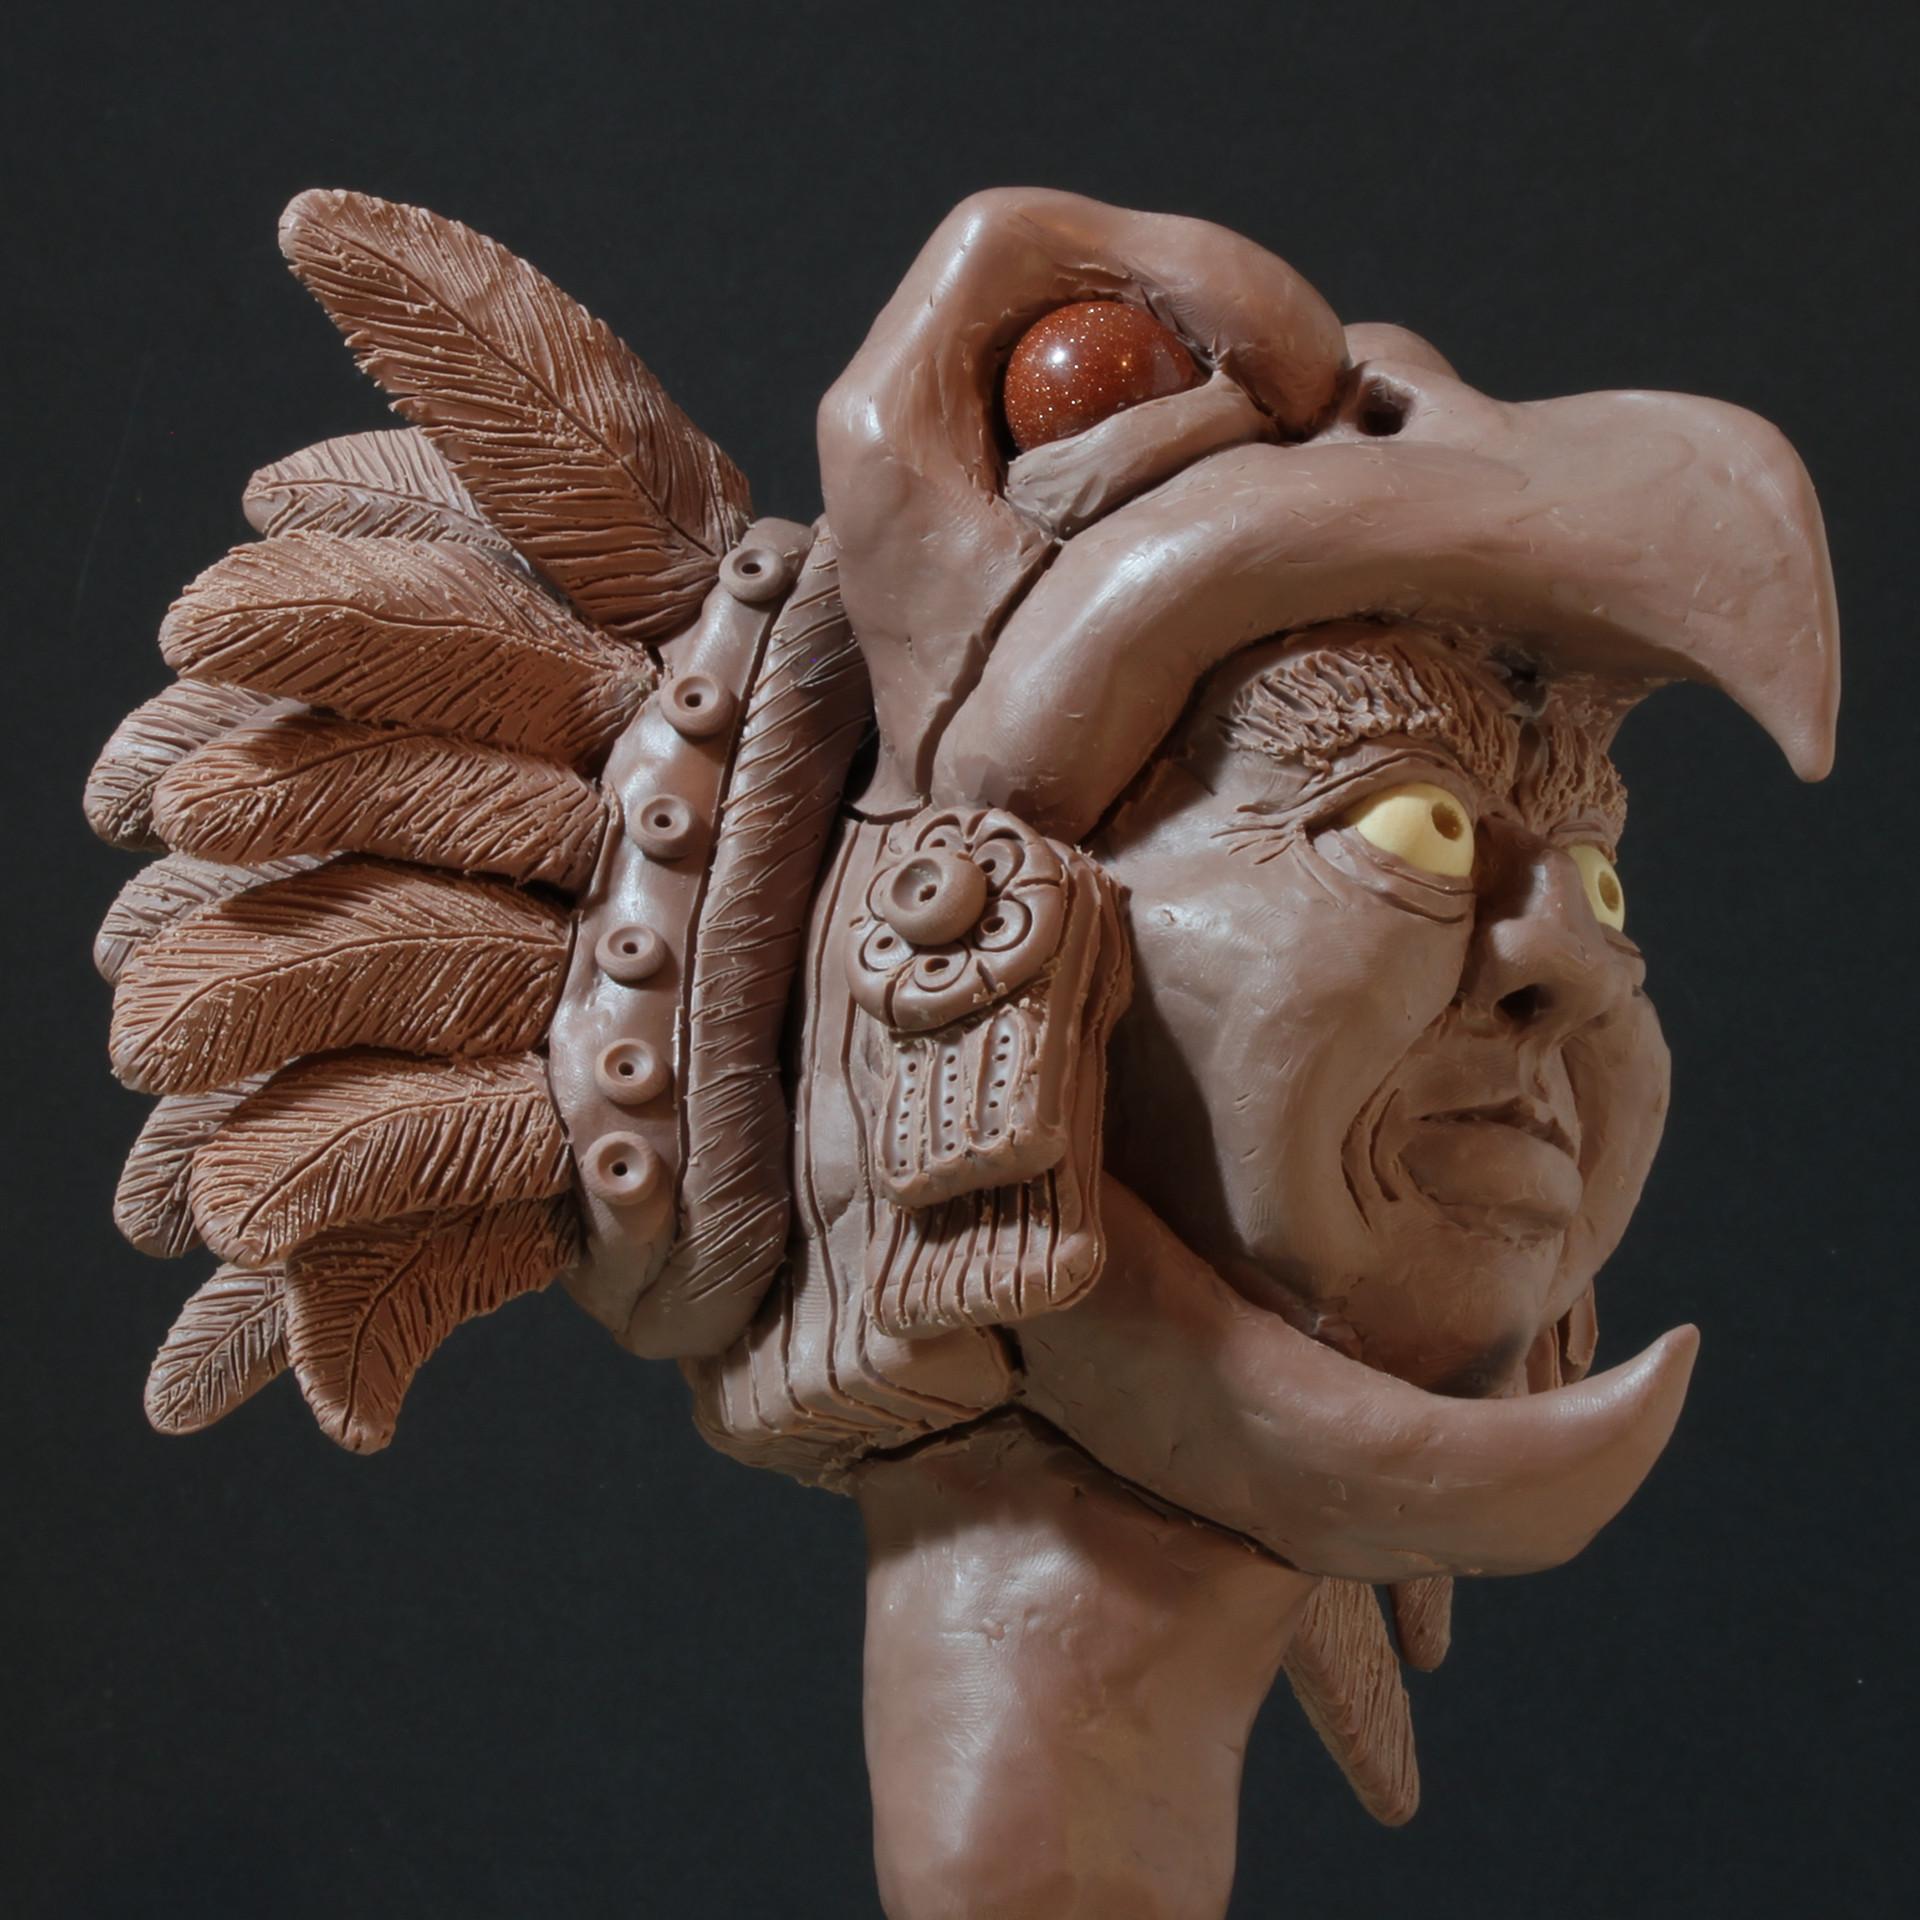 Rob mcdaniel aztec angle low